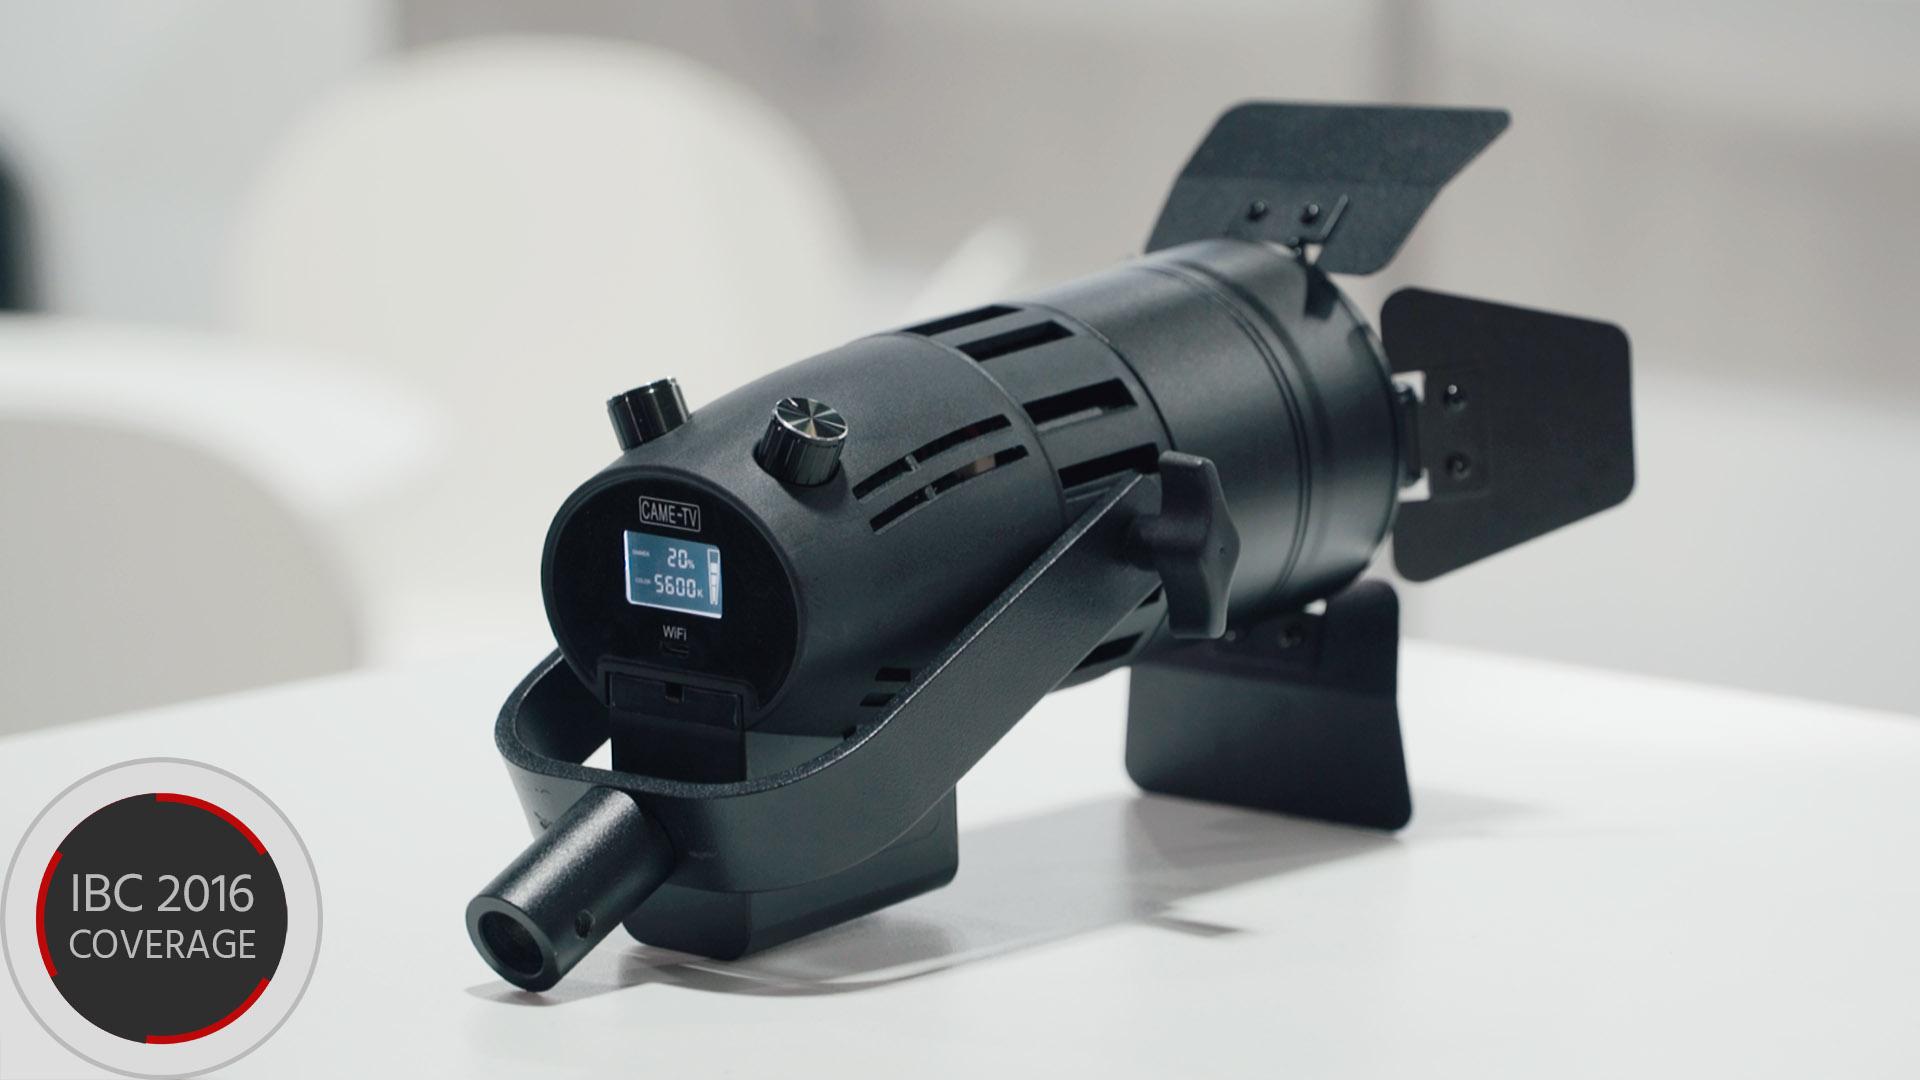 Came-TV Boltzen - コンパクトでリモコン可能なLEDフルネルライト